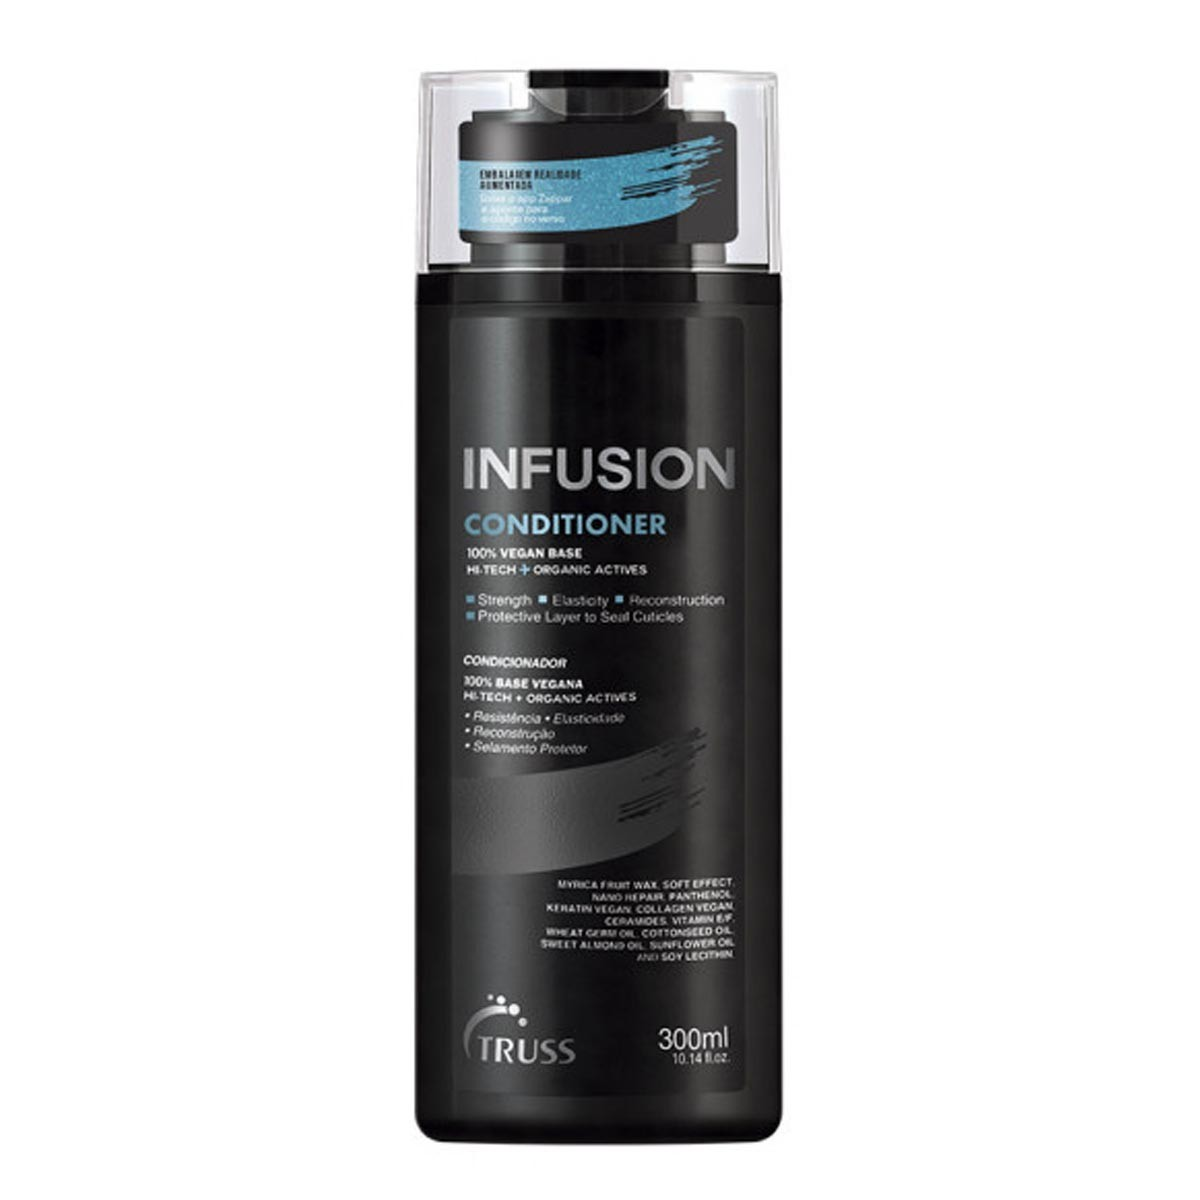 Kit Truss Shampoo + Condicionador Infusion 300ml